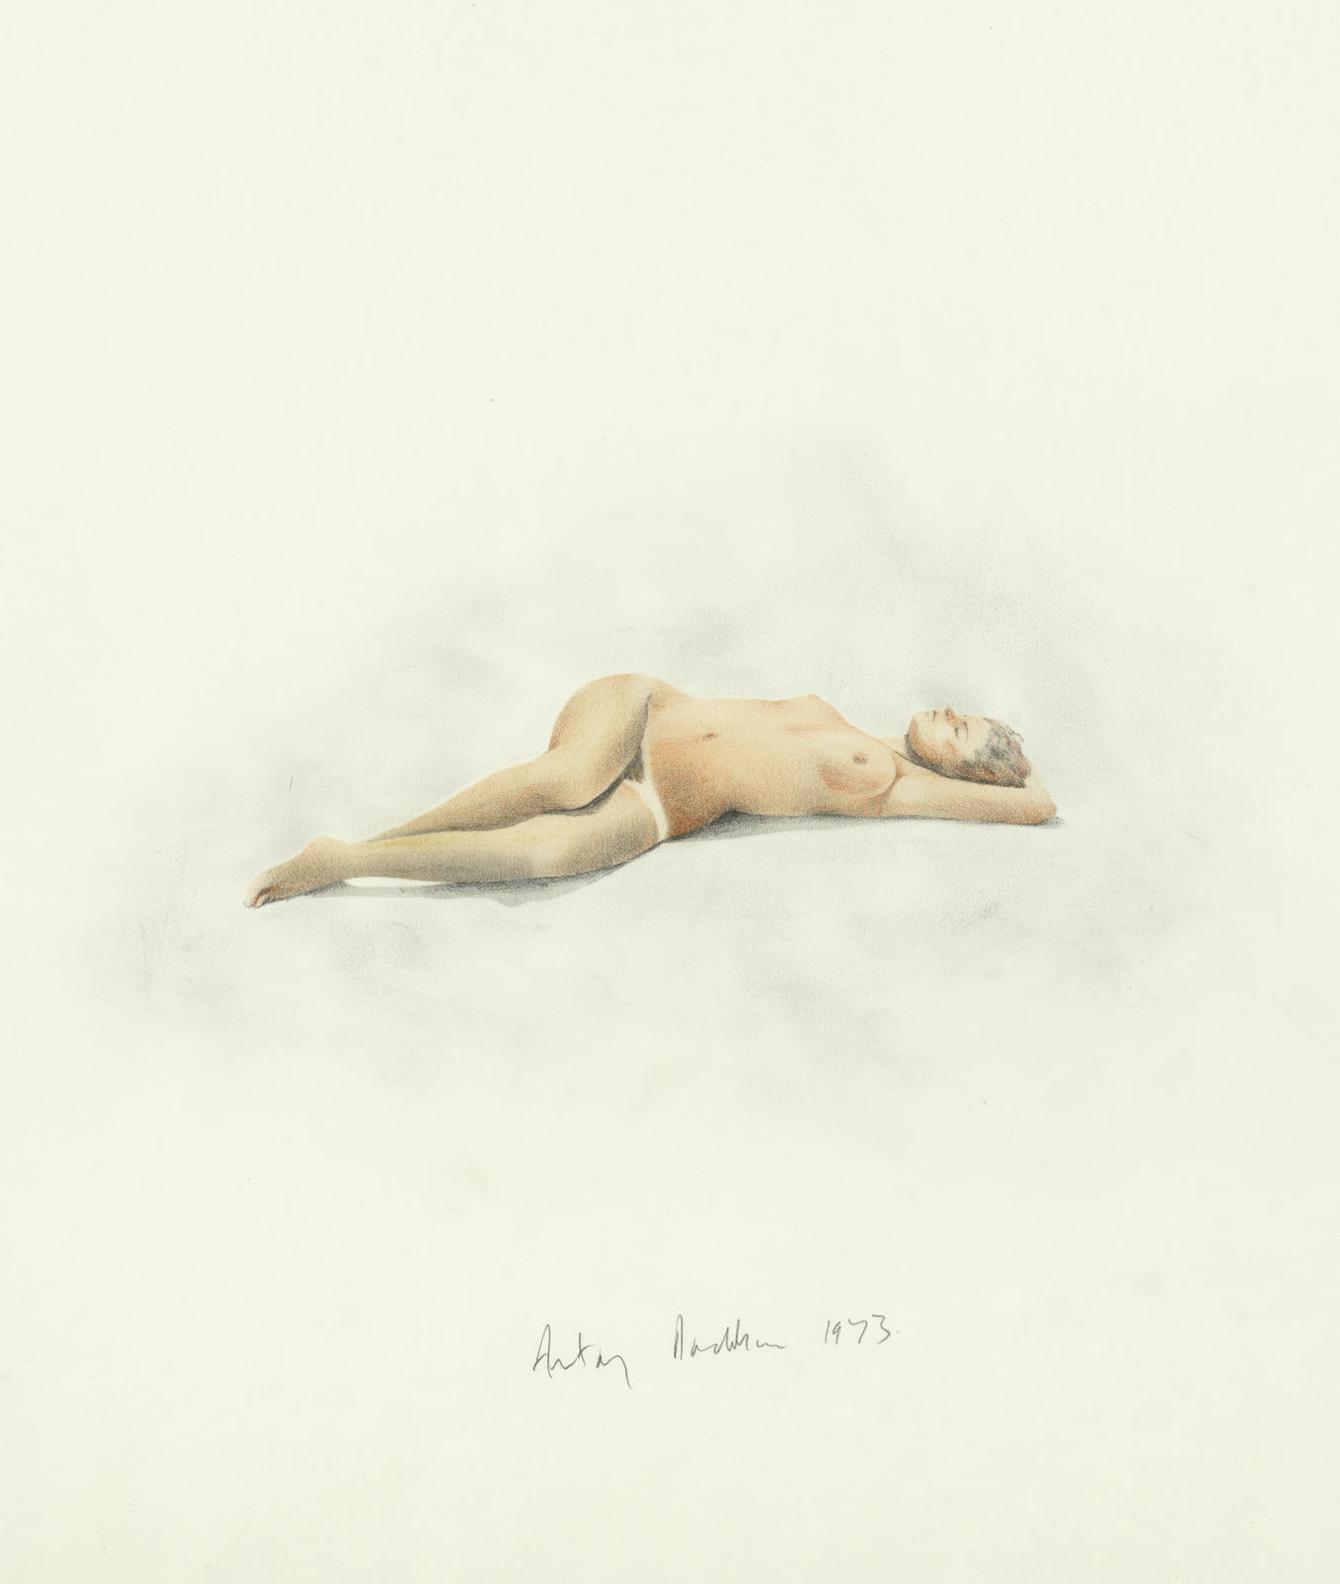 Antony Donaldson - Reclining Female Nude-1973